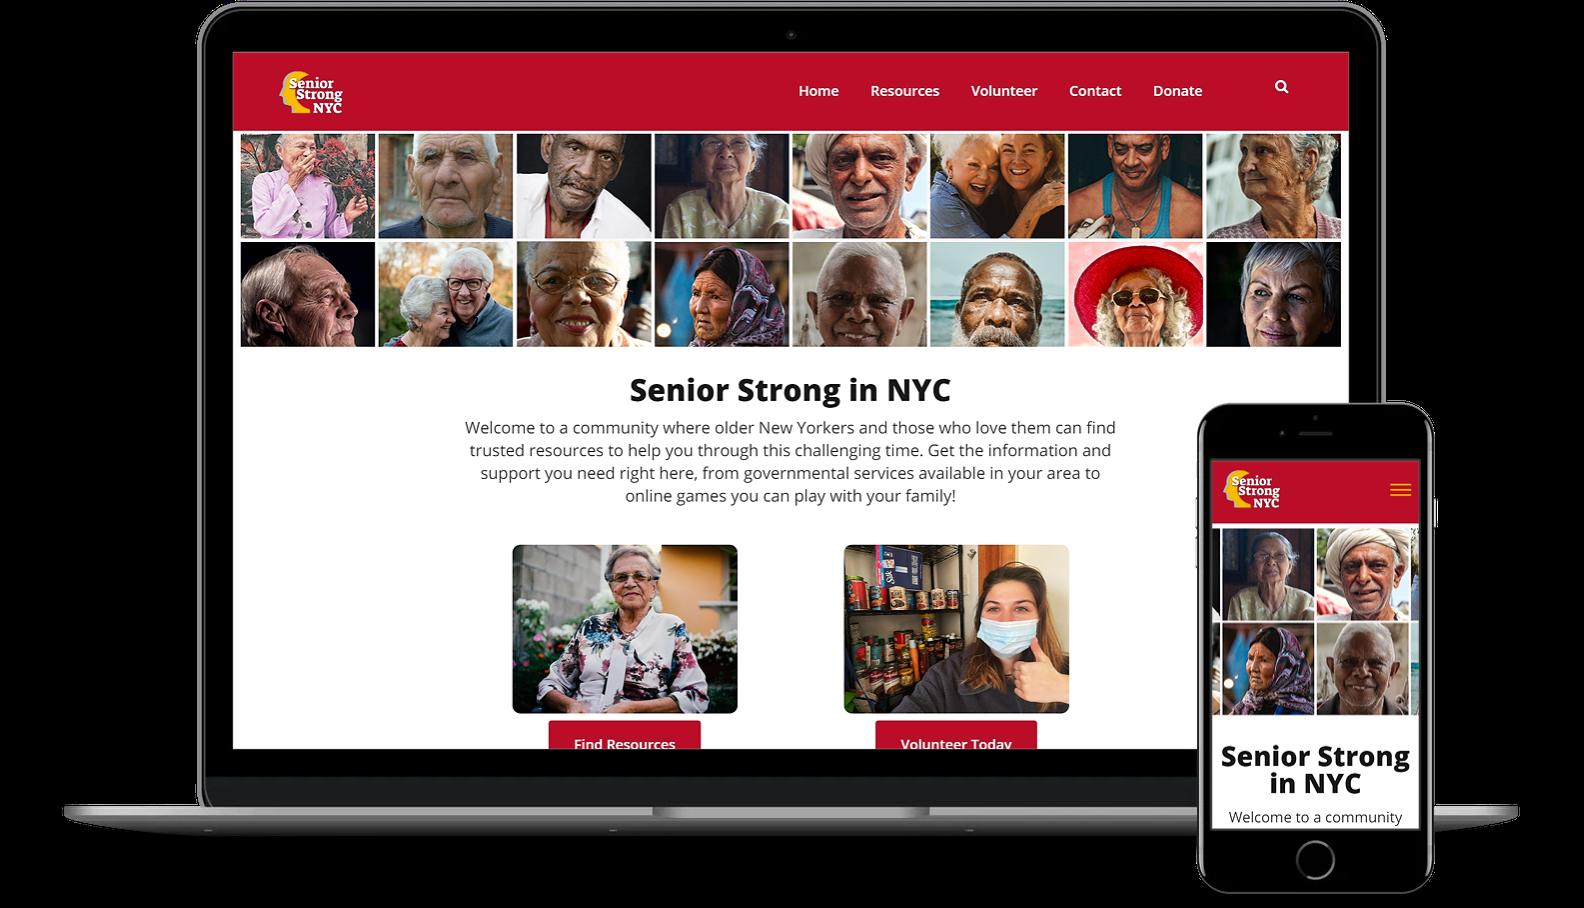 Wordpress Development for Senior Strong NYC